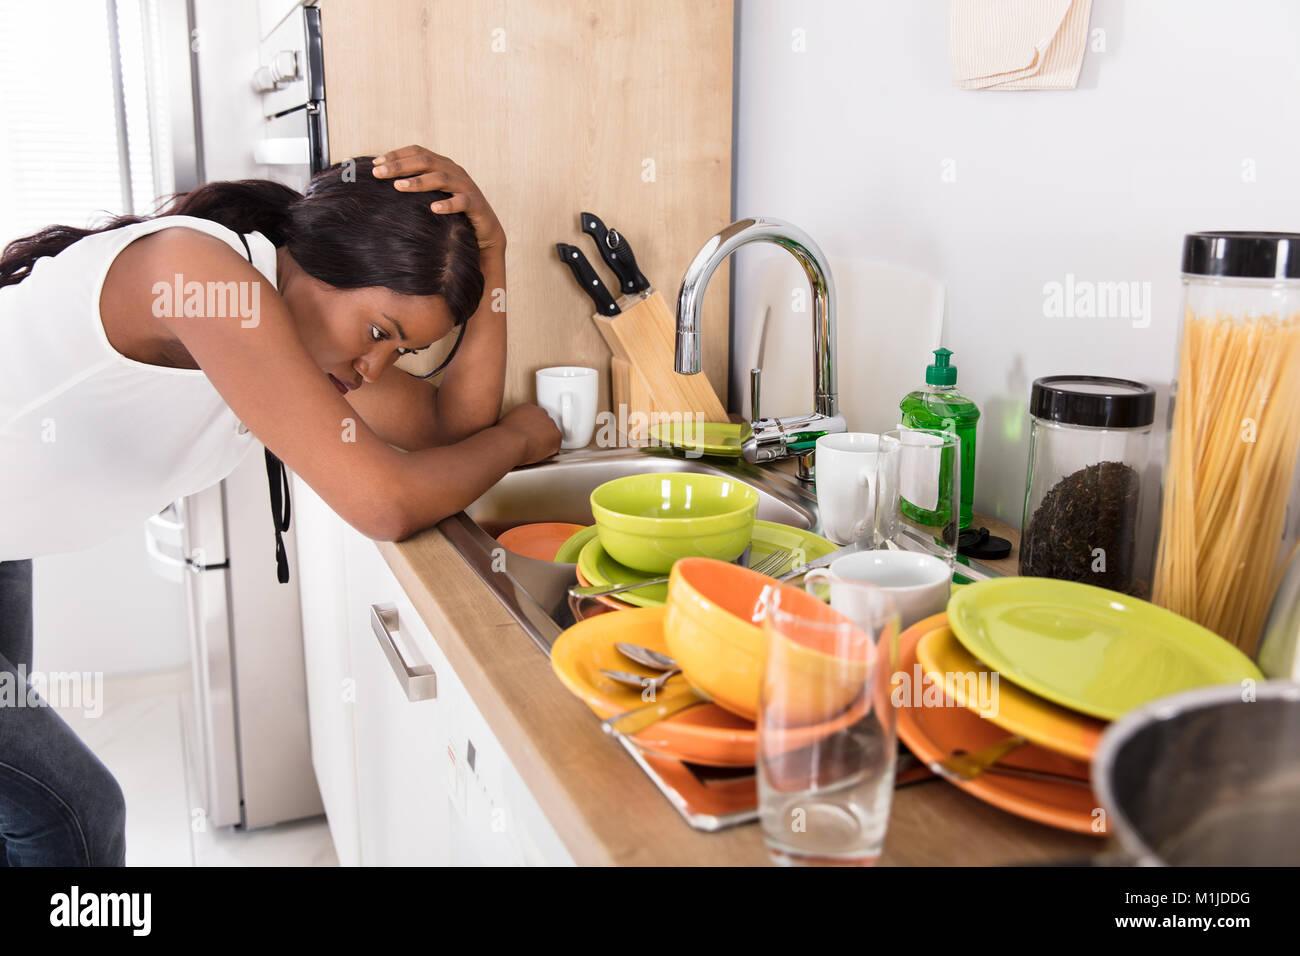 dirty kitchen dishes stockfotos dirty kitchen dishes bilder seite 3 alamy. Black Bedroom Furniture Sets. Home Design Ideas